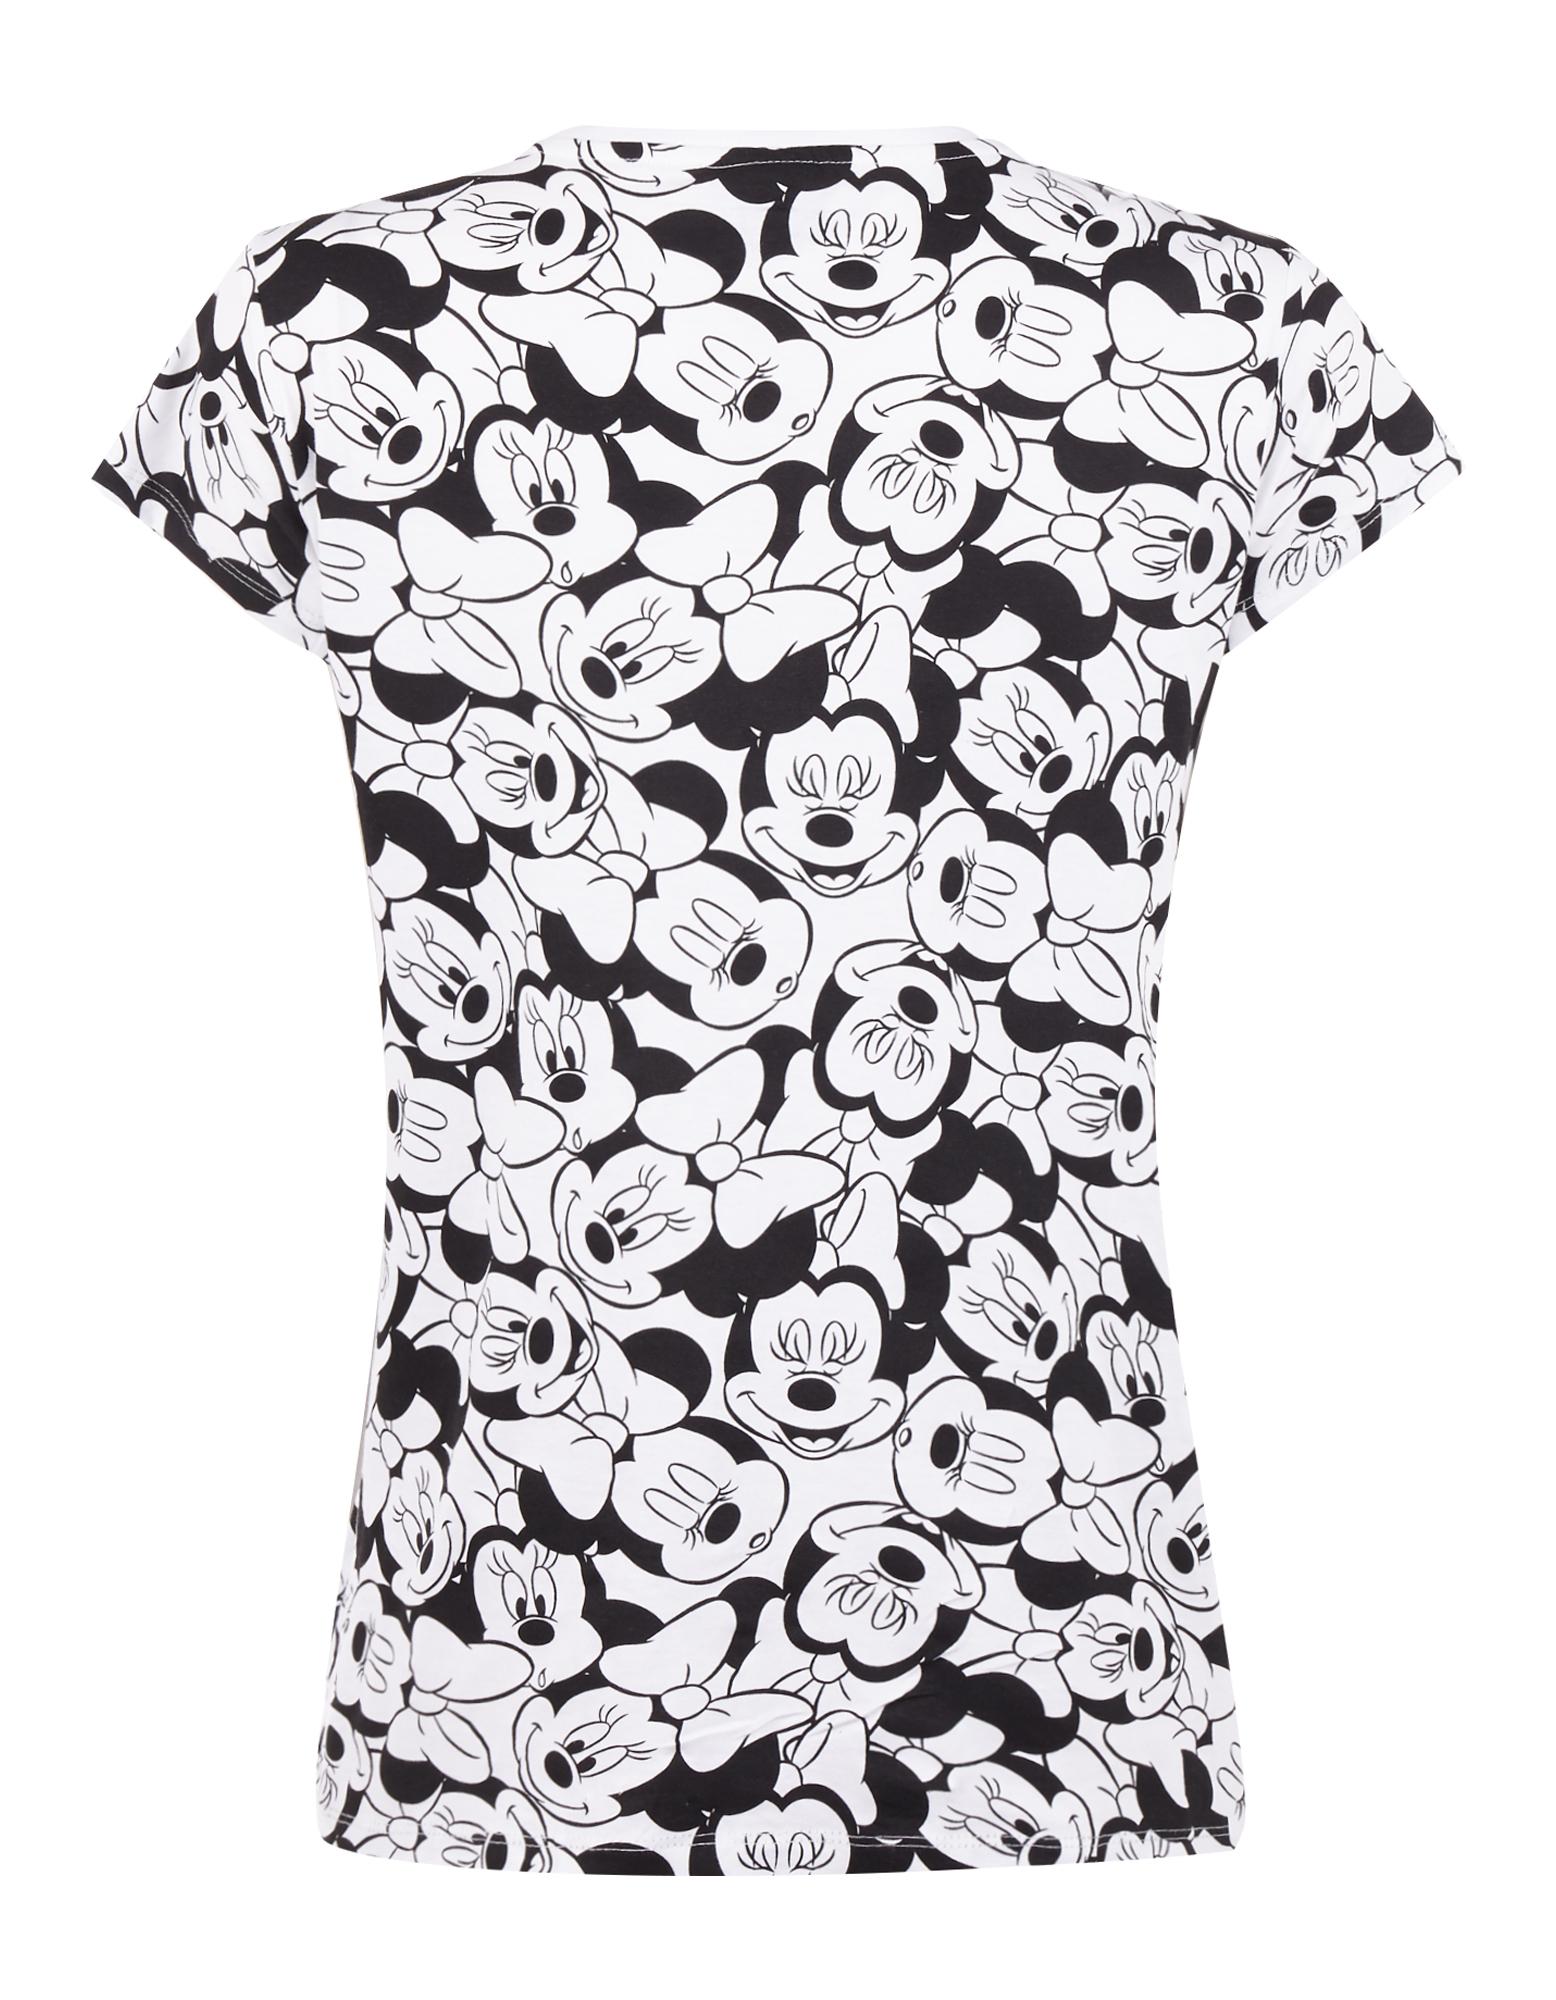 Damen T Shirt Mit Minnie Mouse Print Takko Fashion